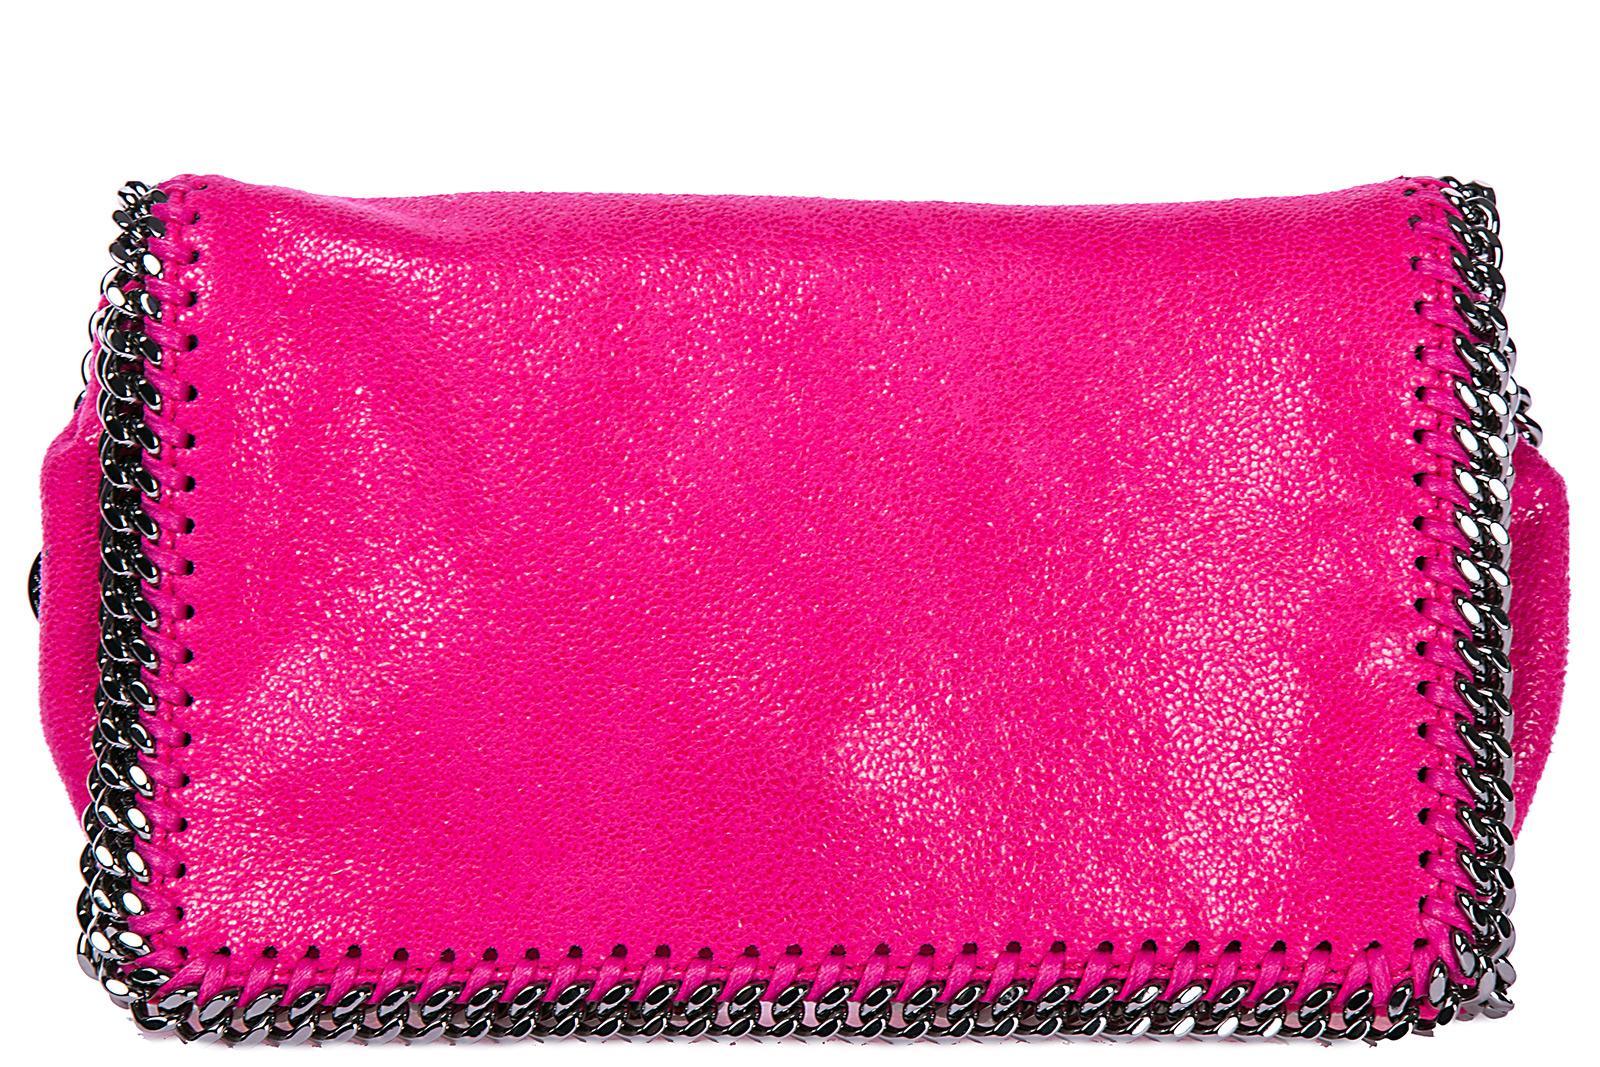 Stella Mccartney Women's Cross-body Messenger Shoulder Bag  Falabella Shaggy Deer In Pink